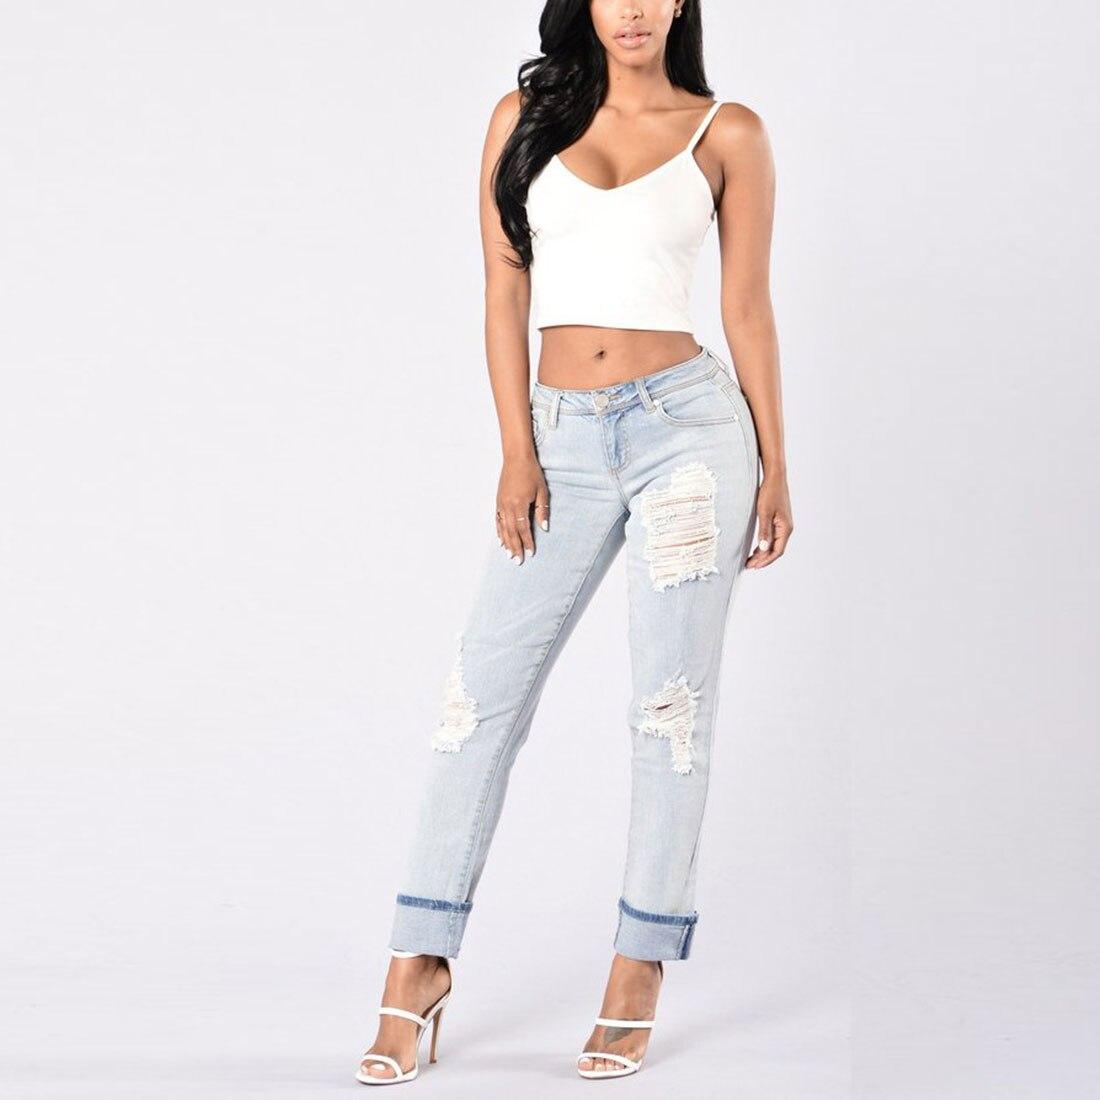 beautiful_cy Store Soft 2017 Fashion Harem Denim Pants Women Ripped Holes Female Jeans With Pockets Jean Trousers New Pantalon